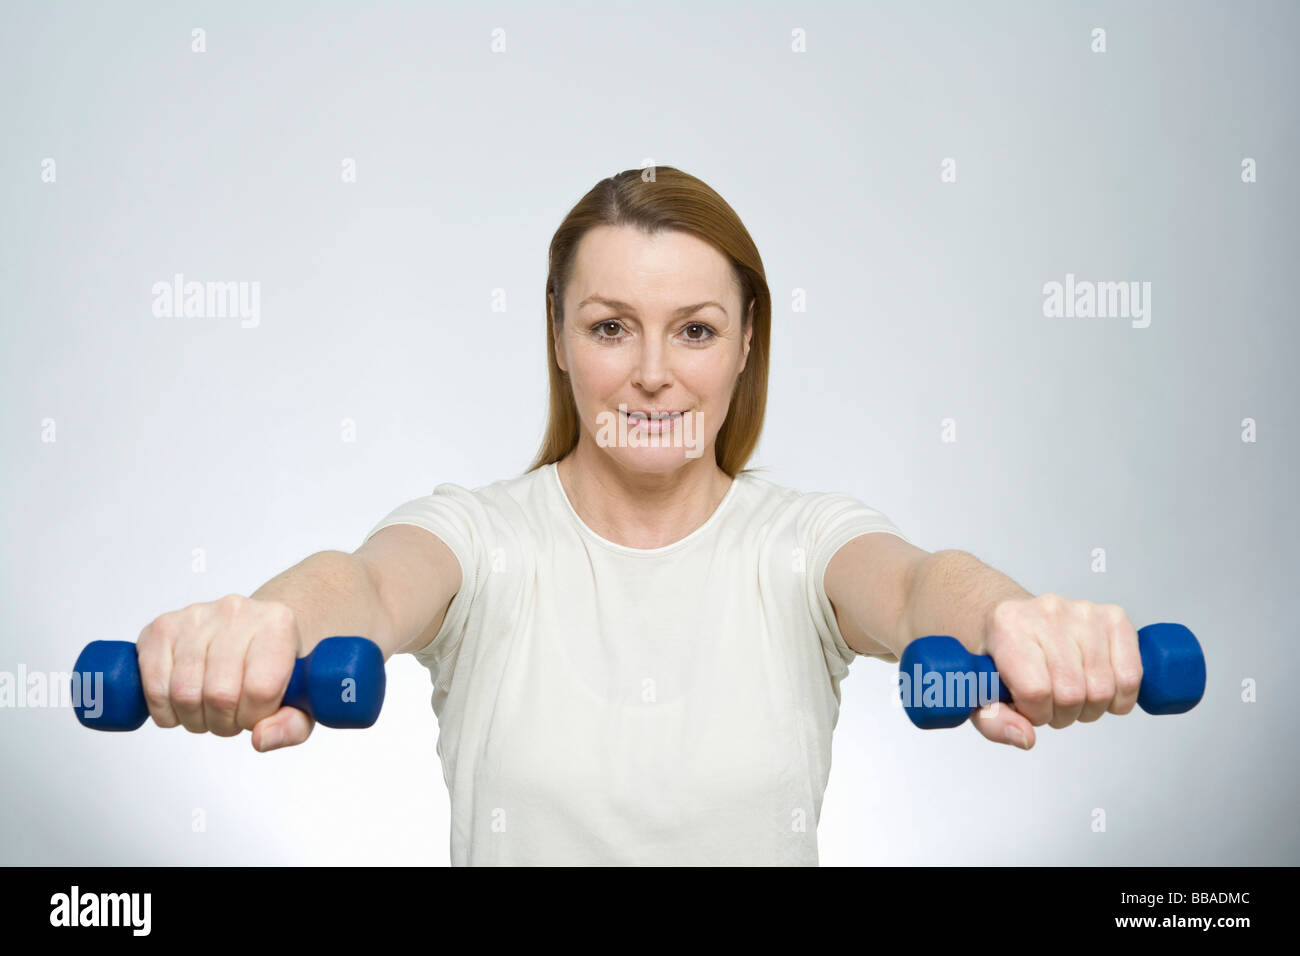 A woman lifting dumbbells - Stock Image